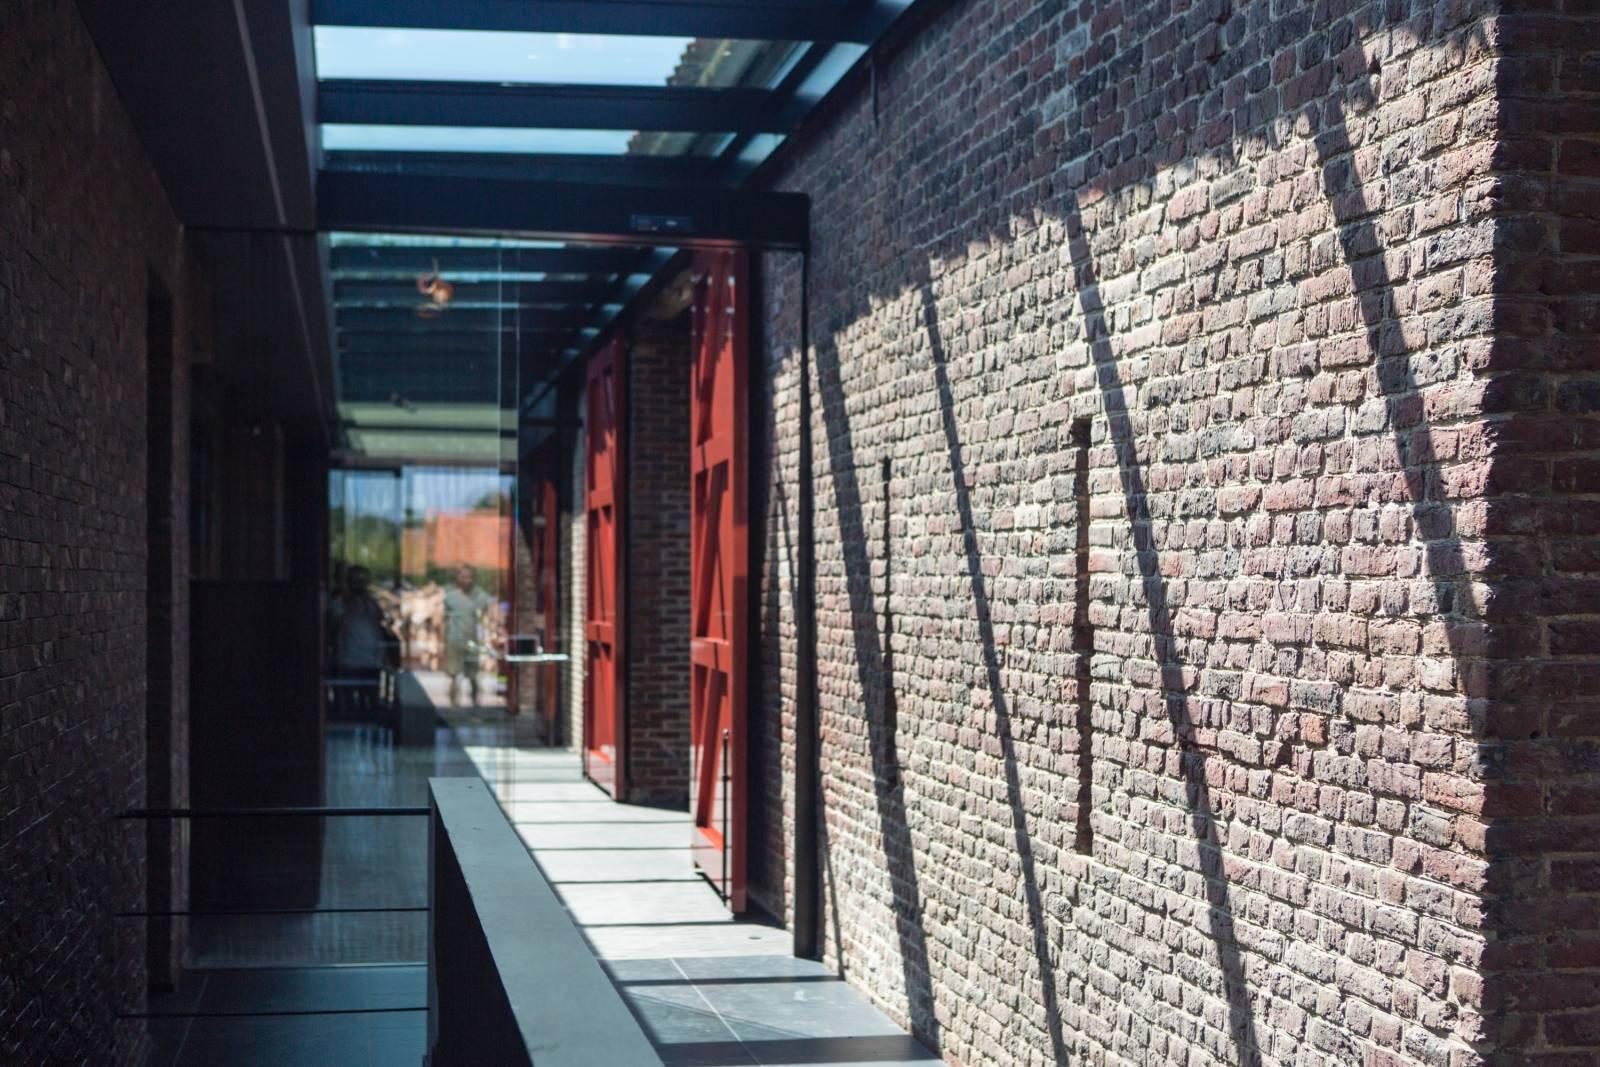 Hertog Jan - Feestzaal - Trouwzaal - House of Weddings - 7